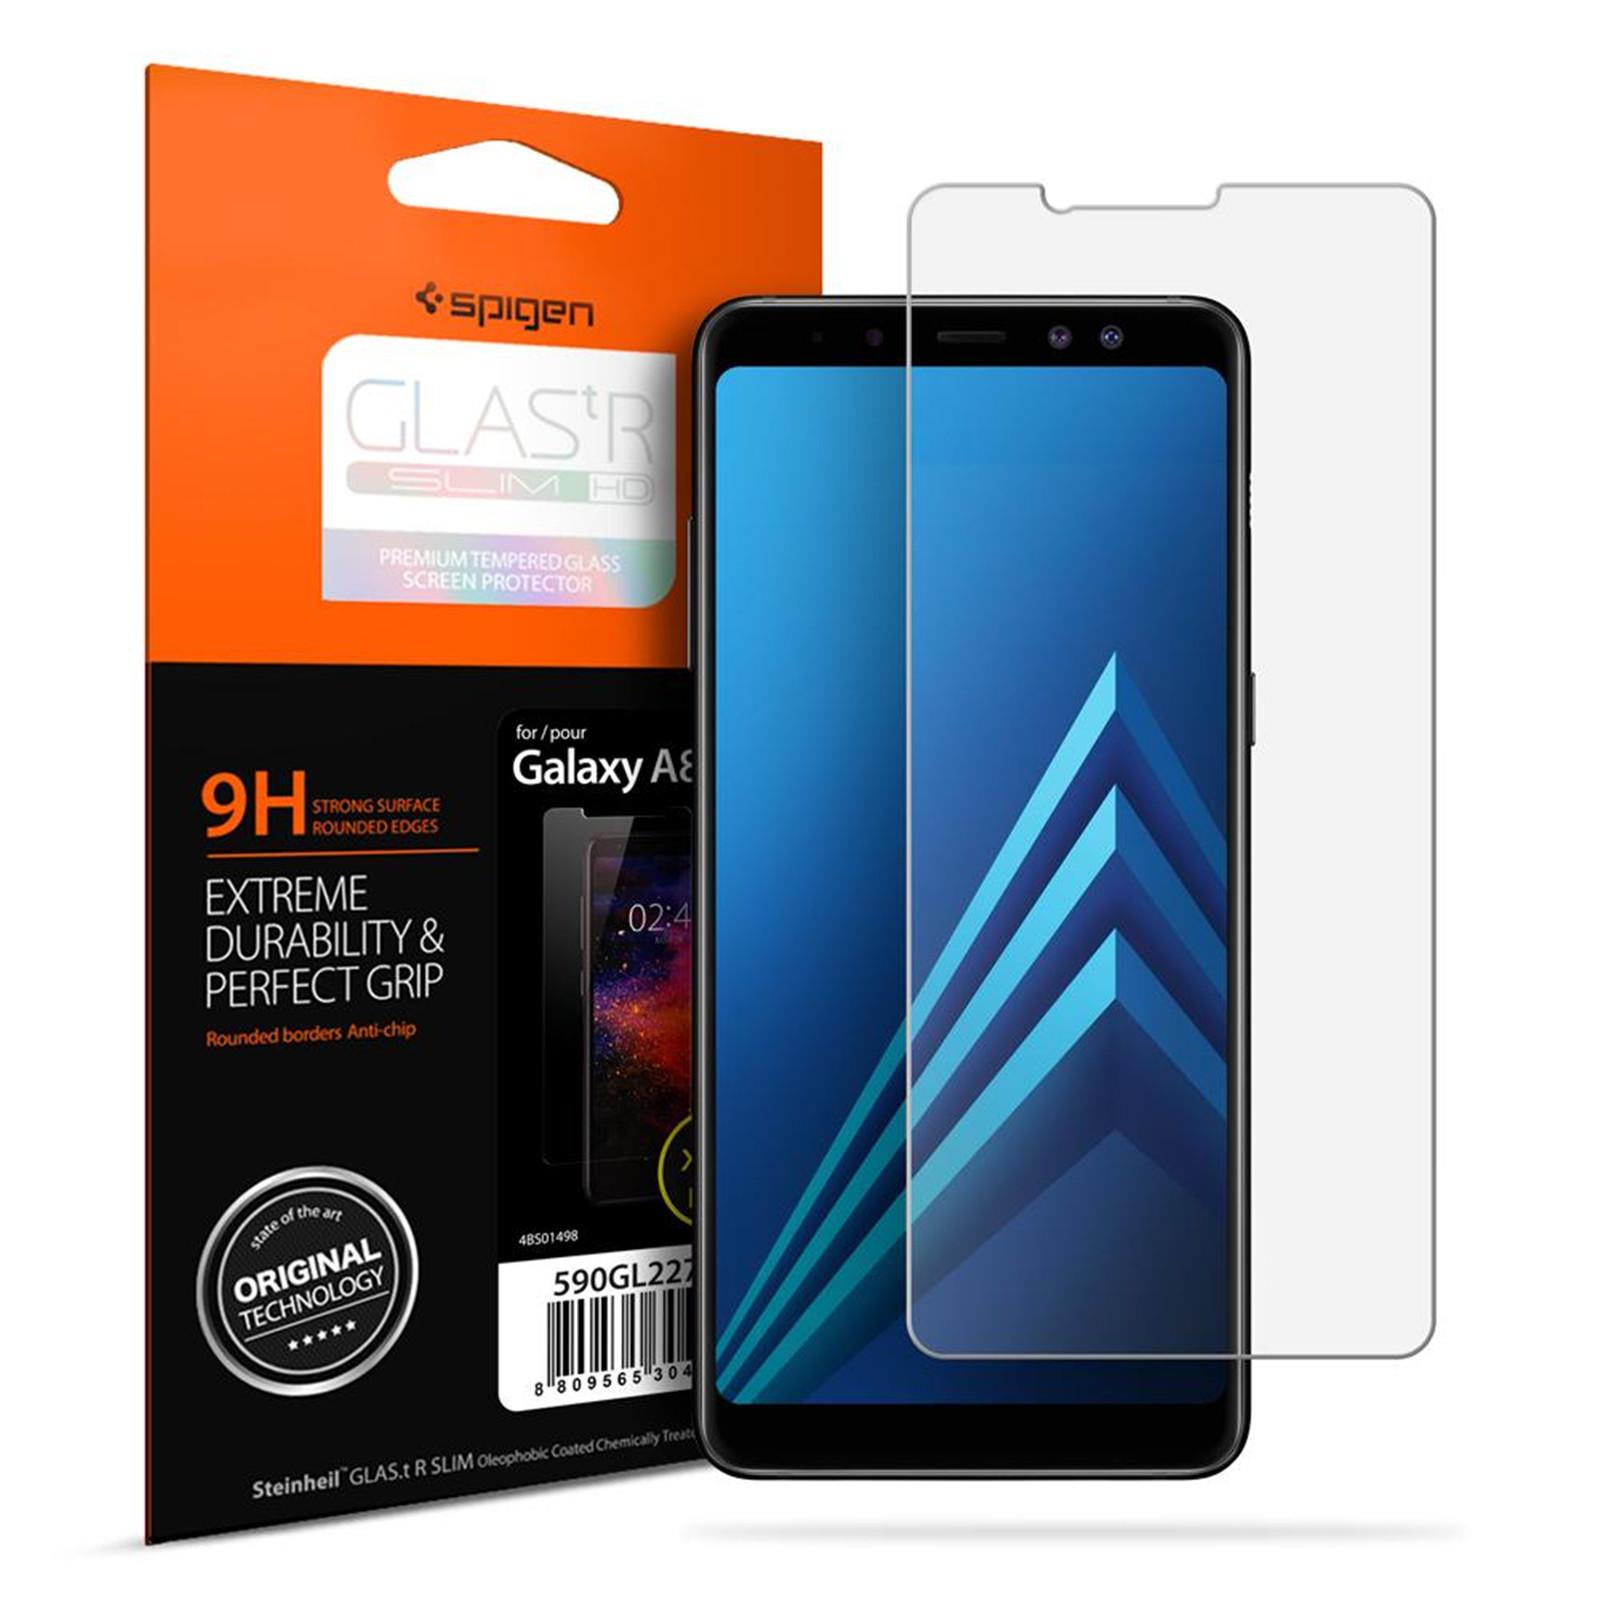 Spigen Galaxy A8 (2018) Premium Tempered Glass Screen Protector, 9H Screen Hardness,